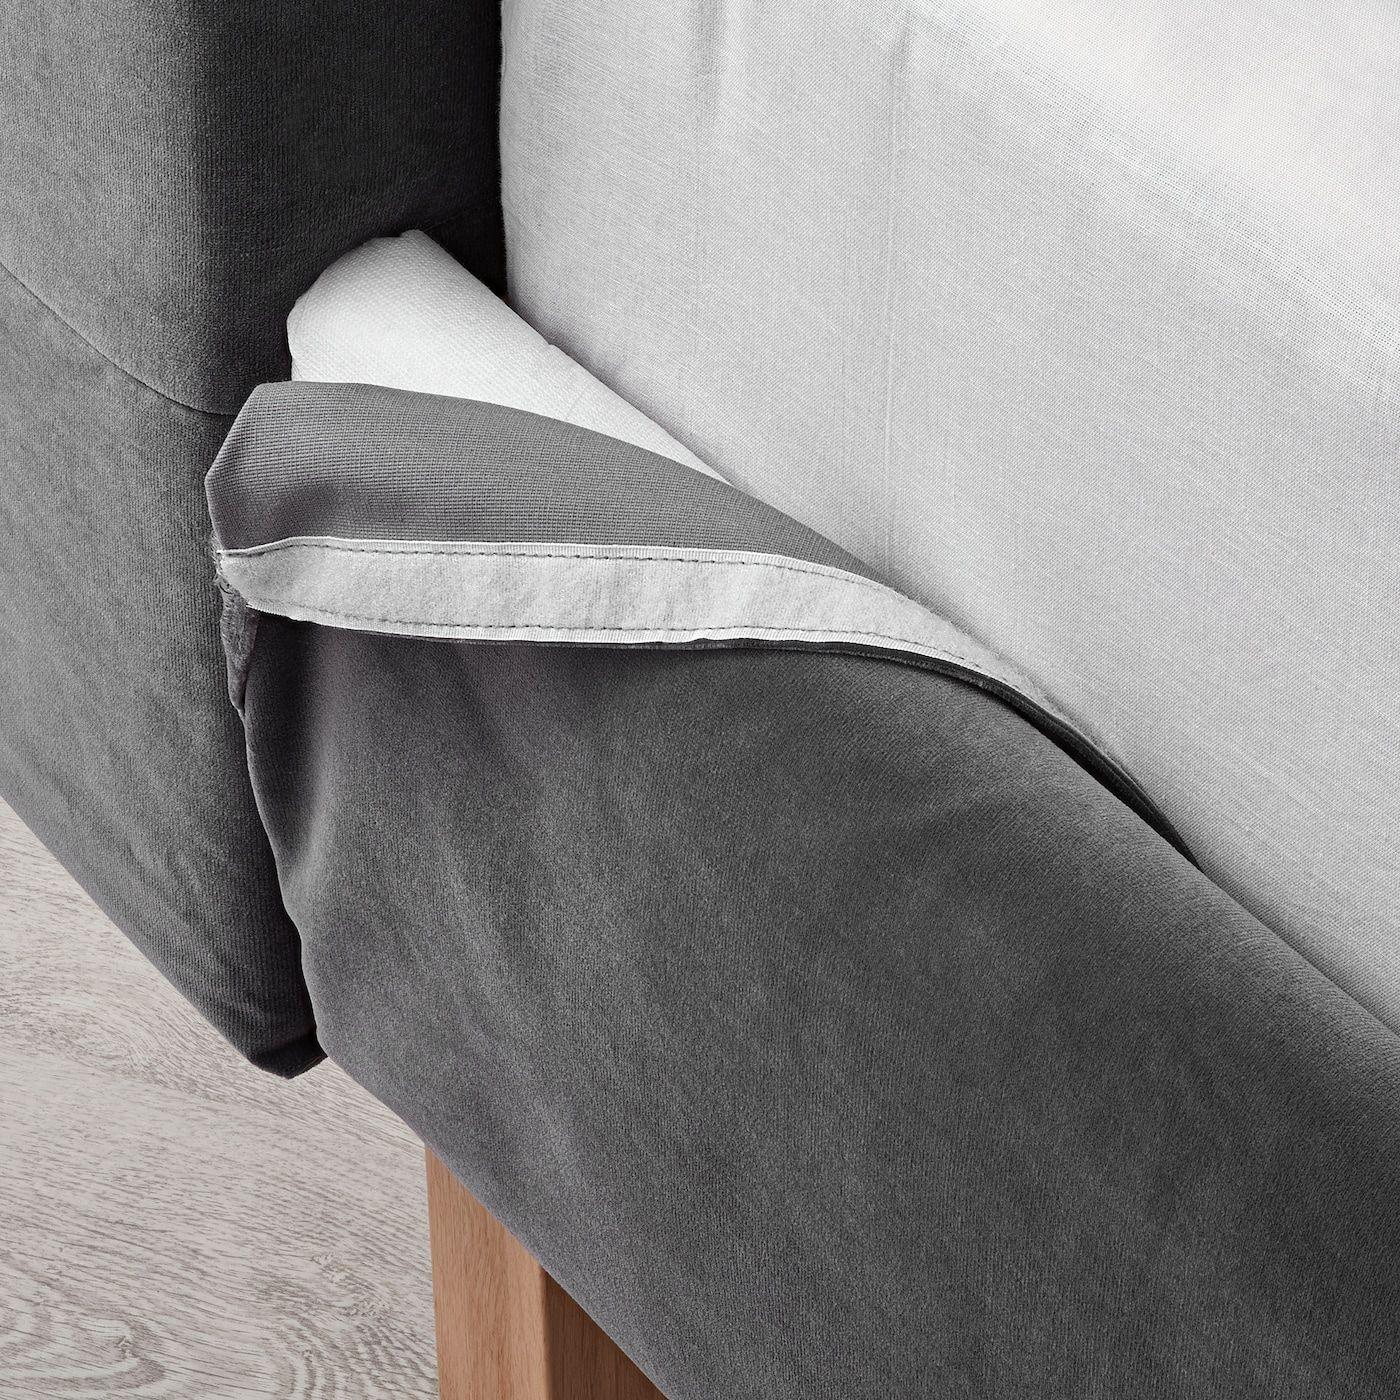 Best Ikea Kvalfjord Sandbacka Dark Gray Luröy Bed Frame In 640 x 480